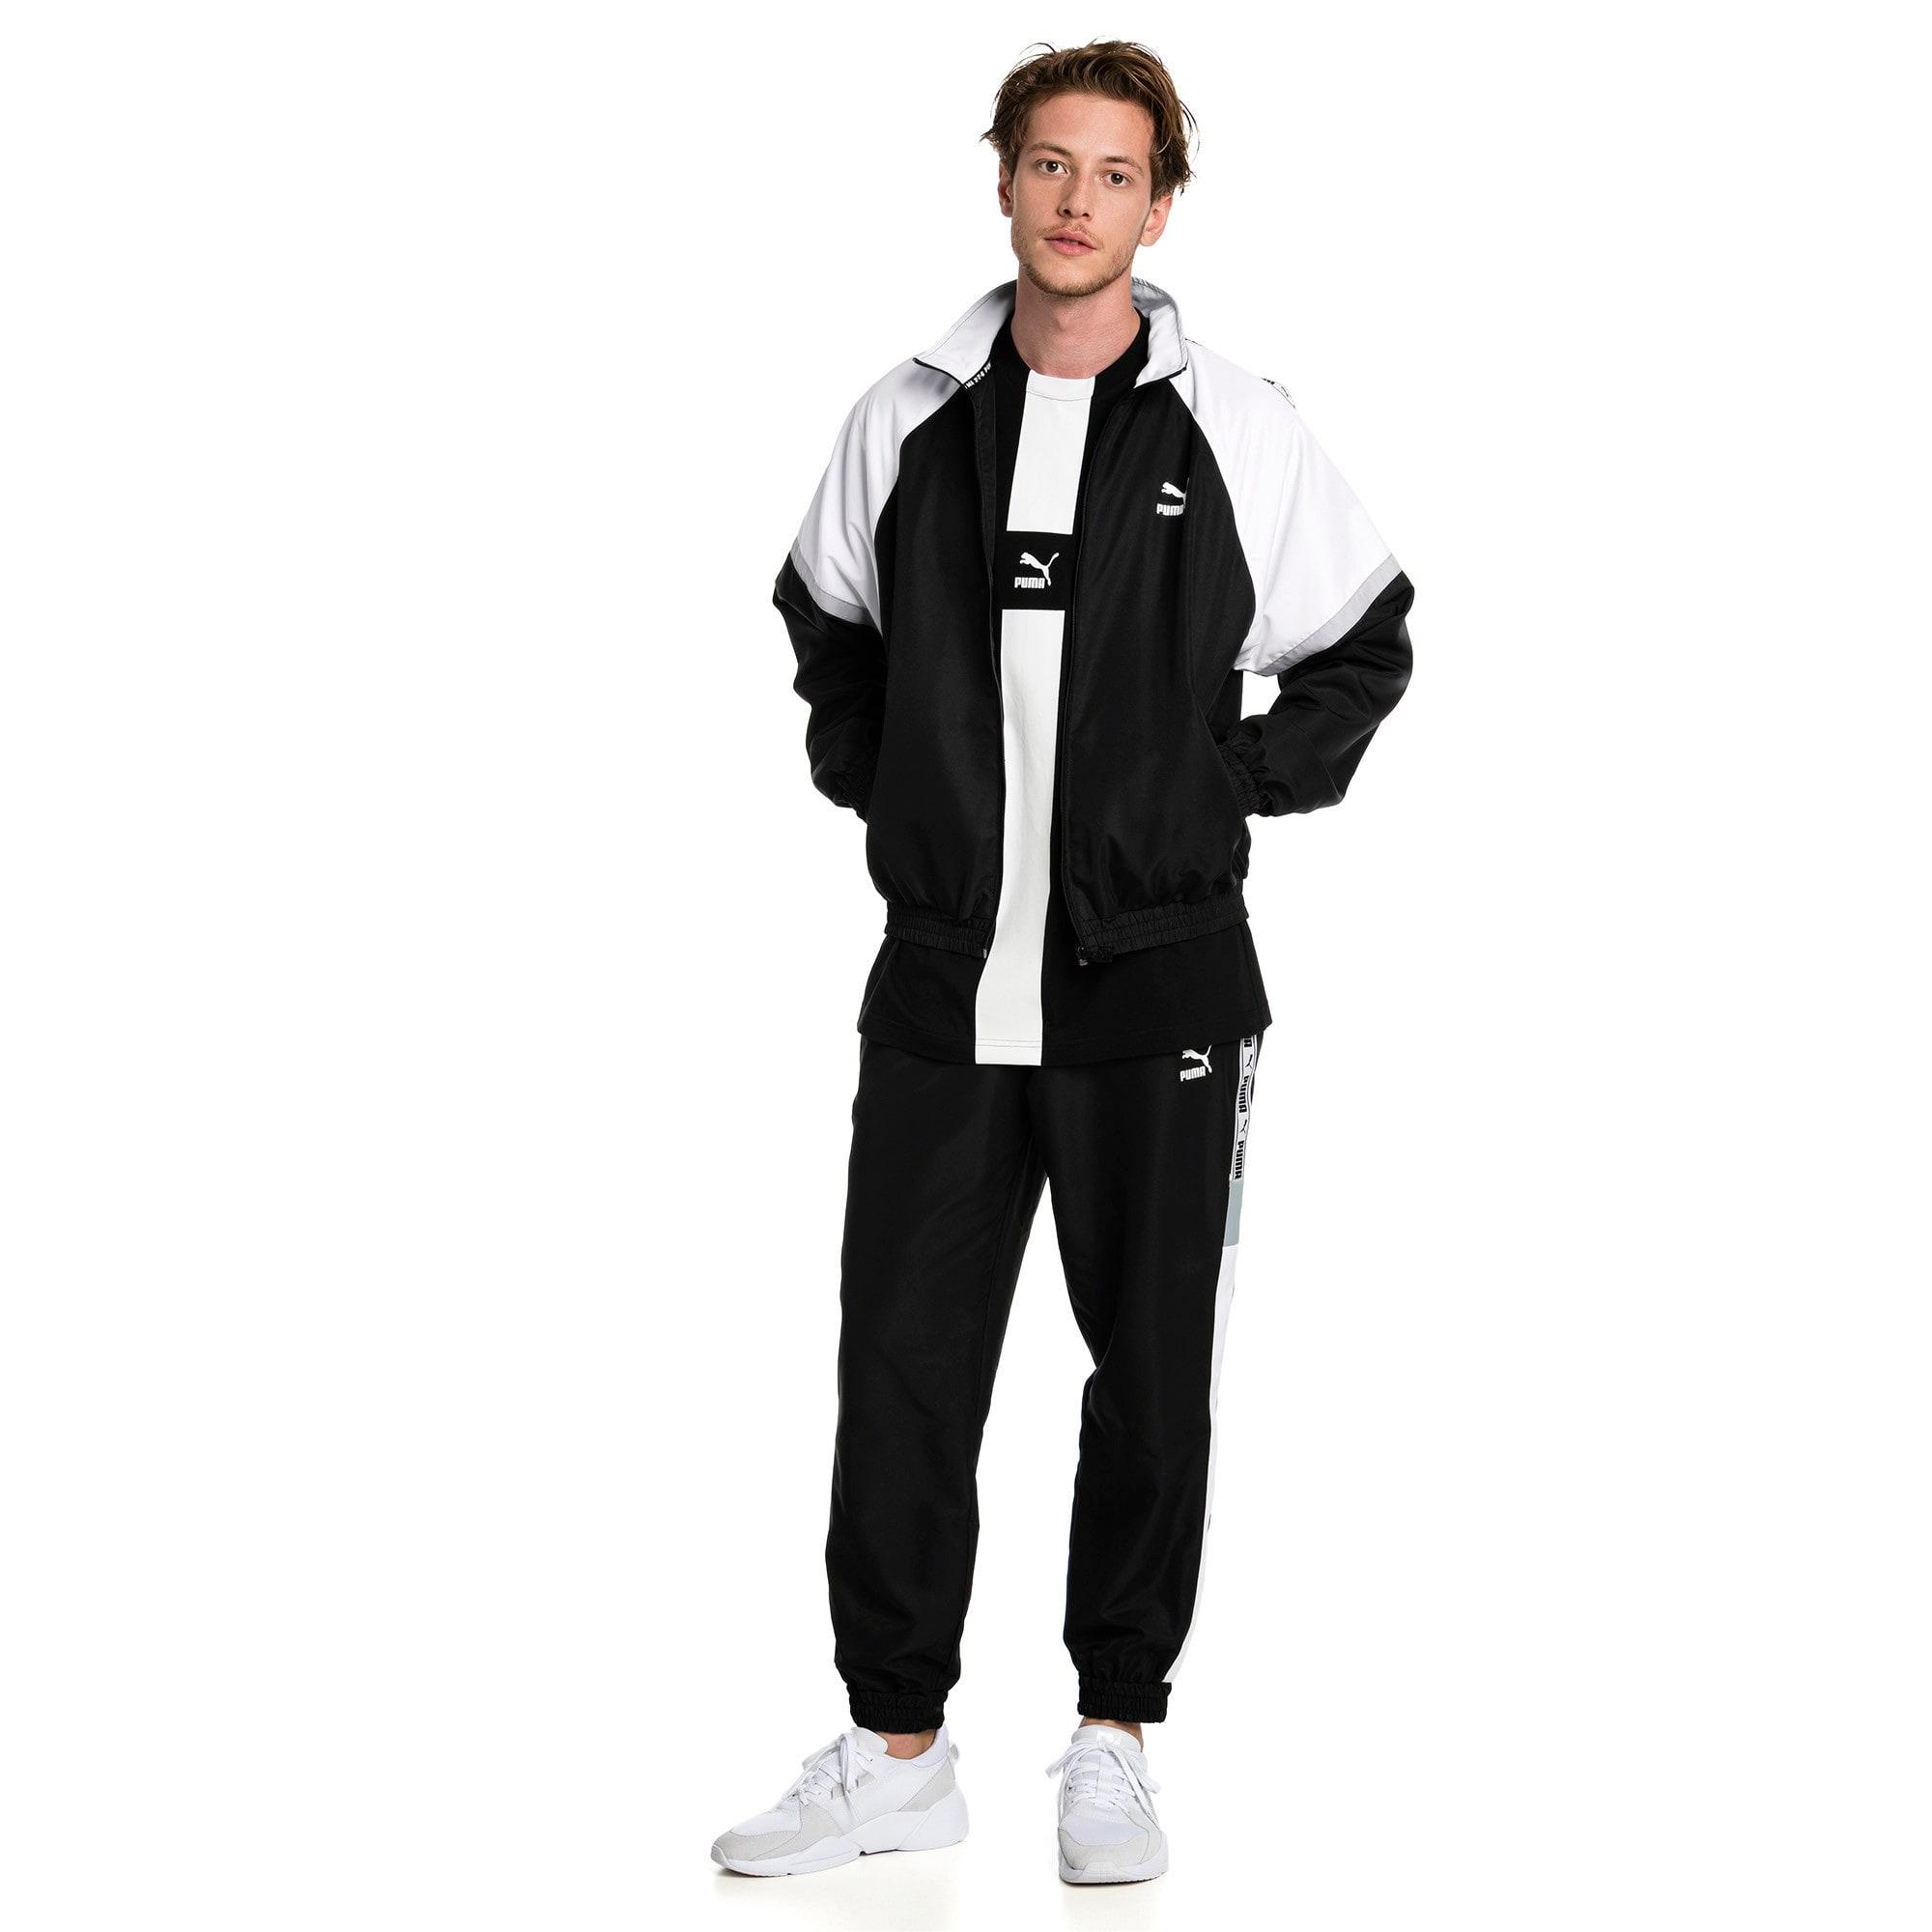 Thumbnail 3 of PUMA XTG Full Zip Men's Woven Jacket, Puma Black-Puma white, medium